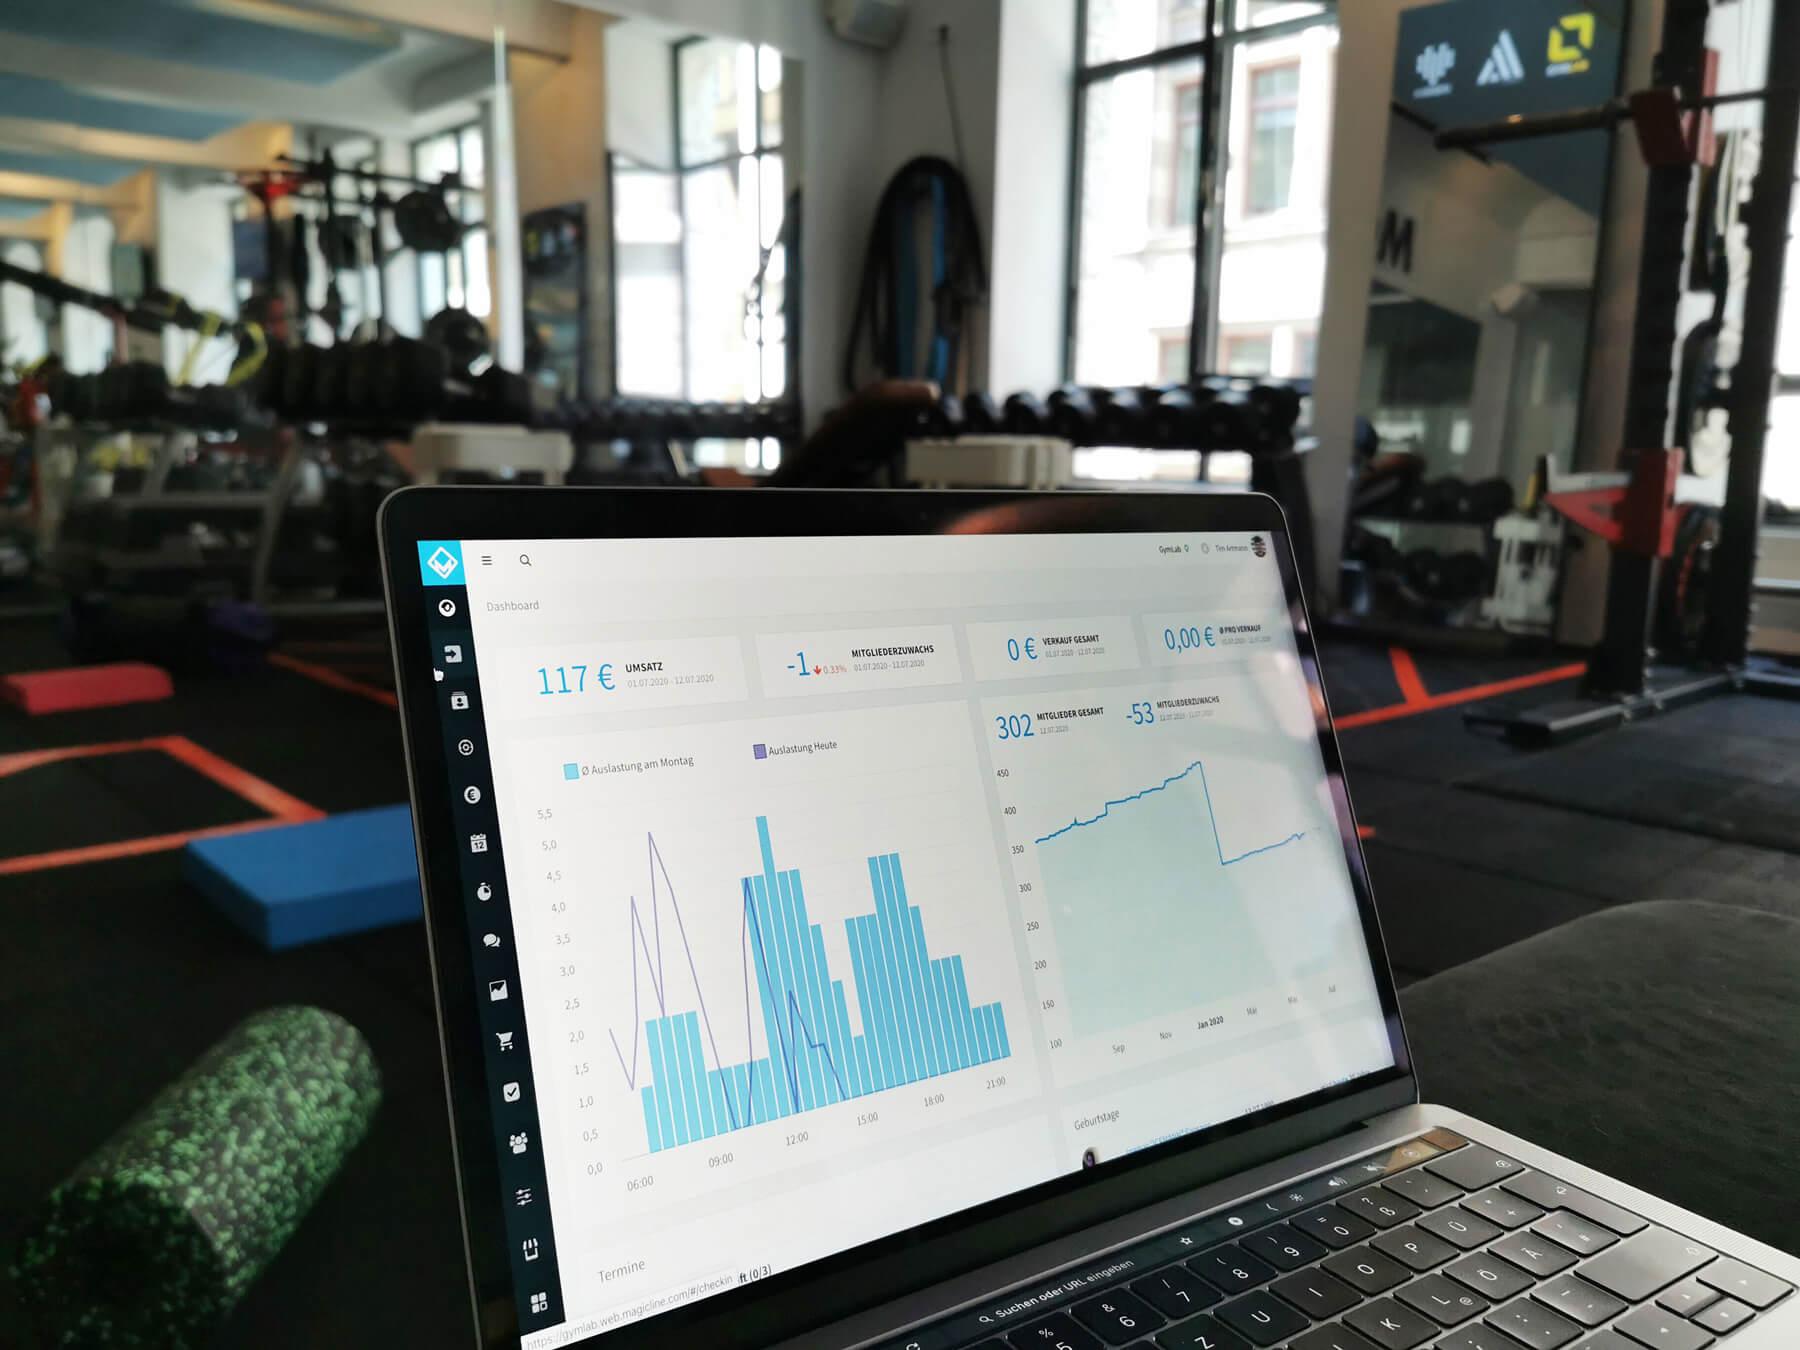 Gym software